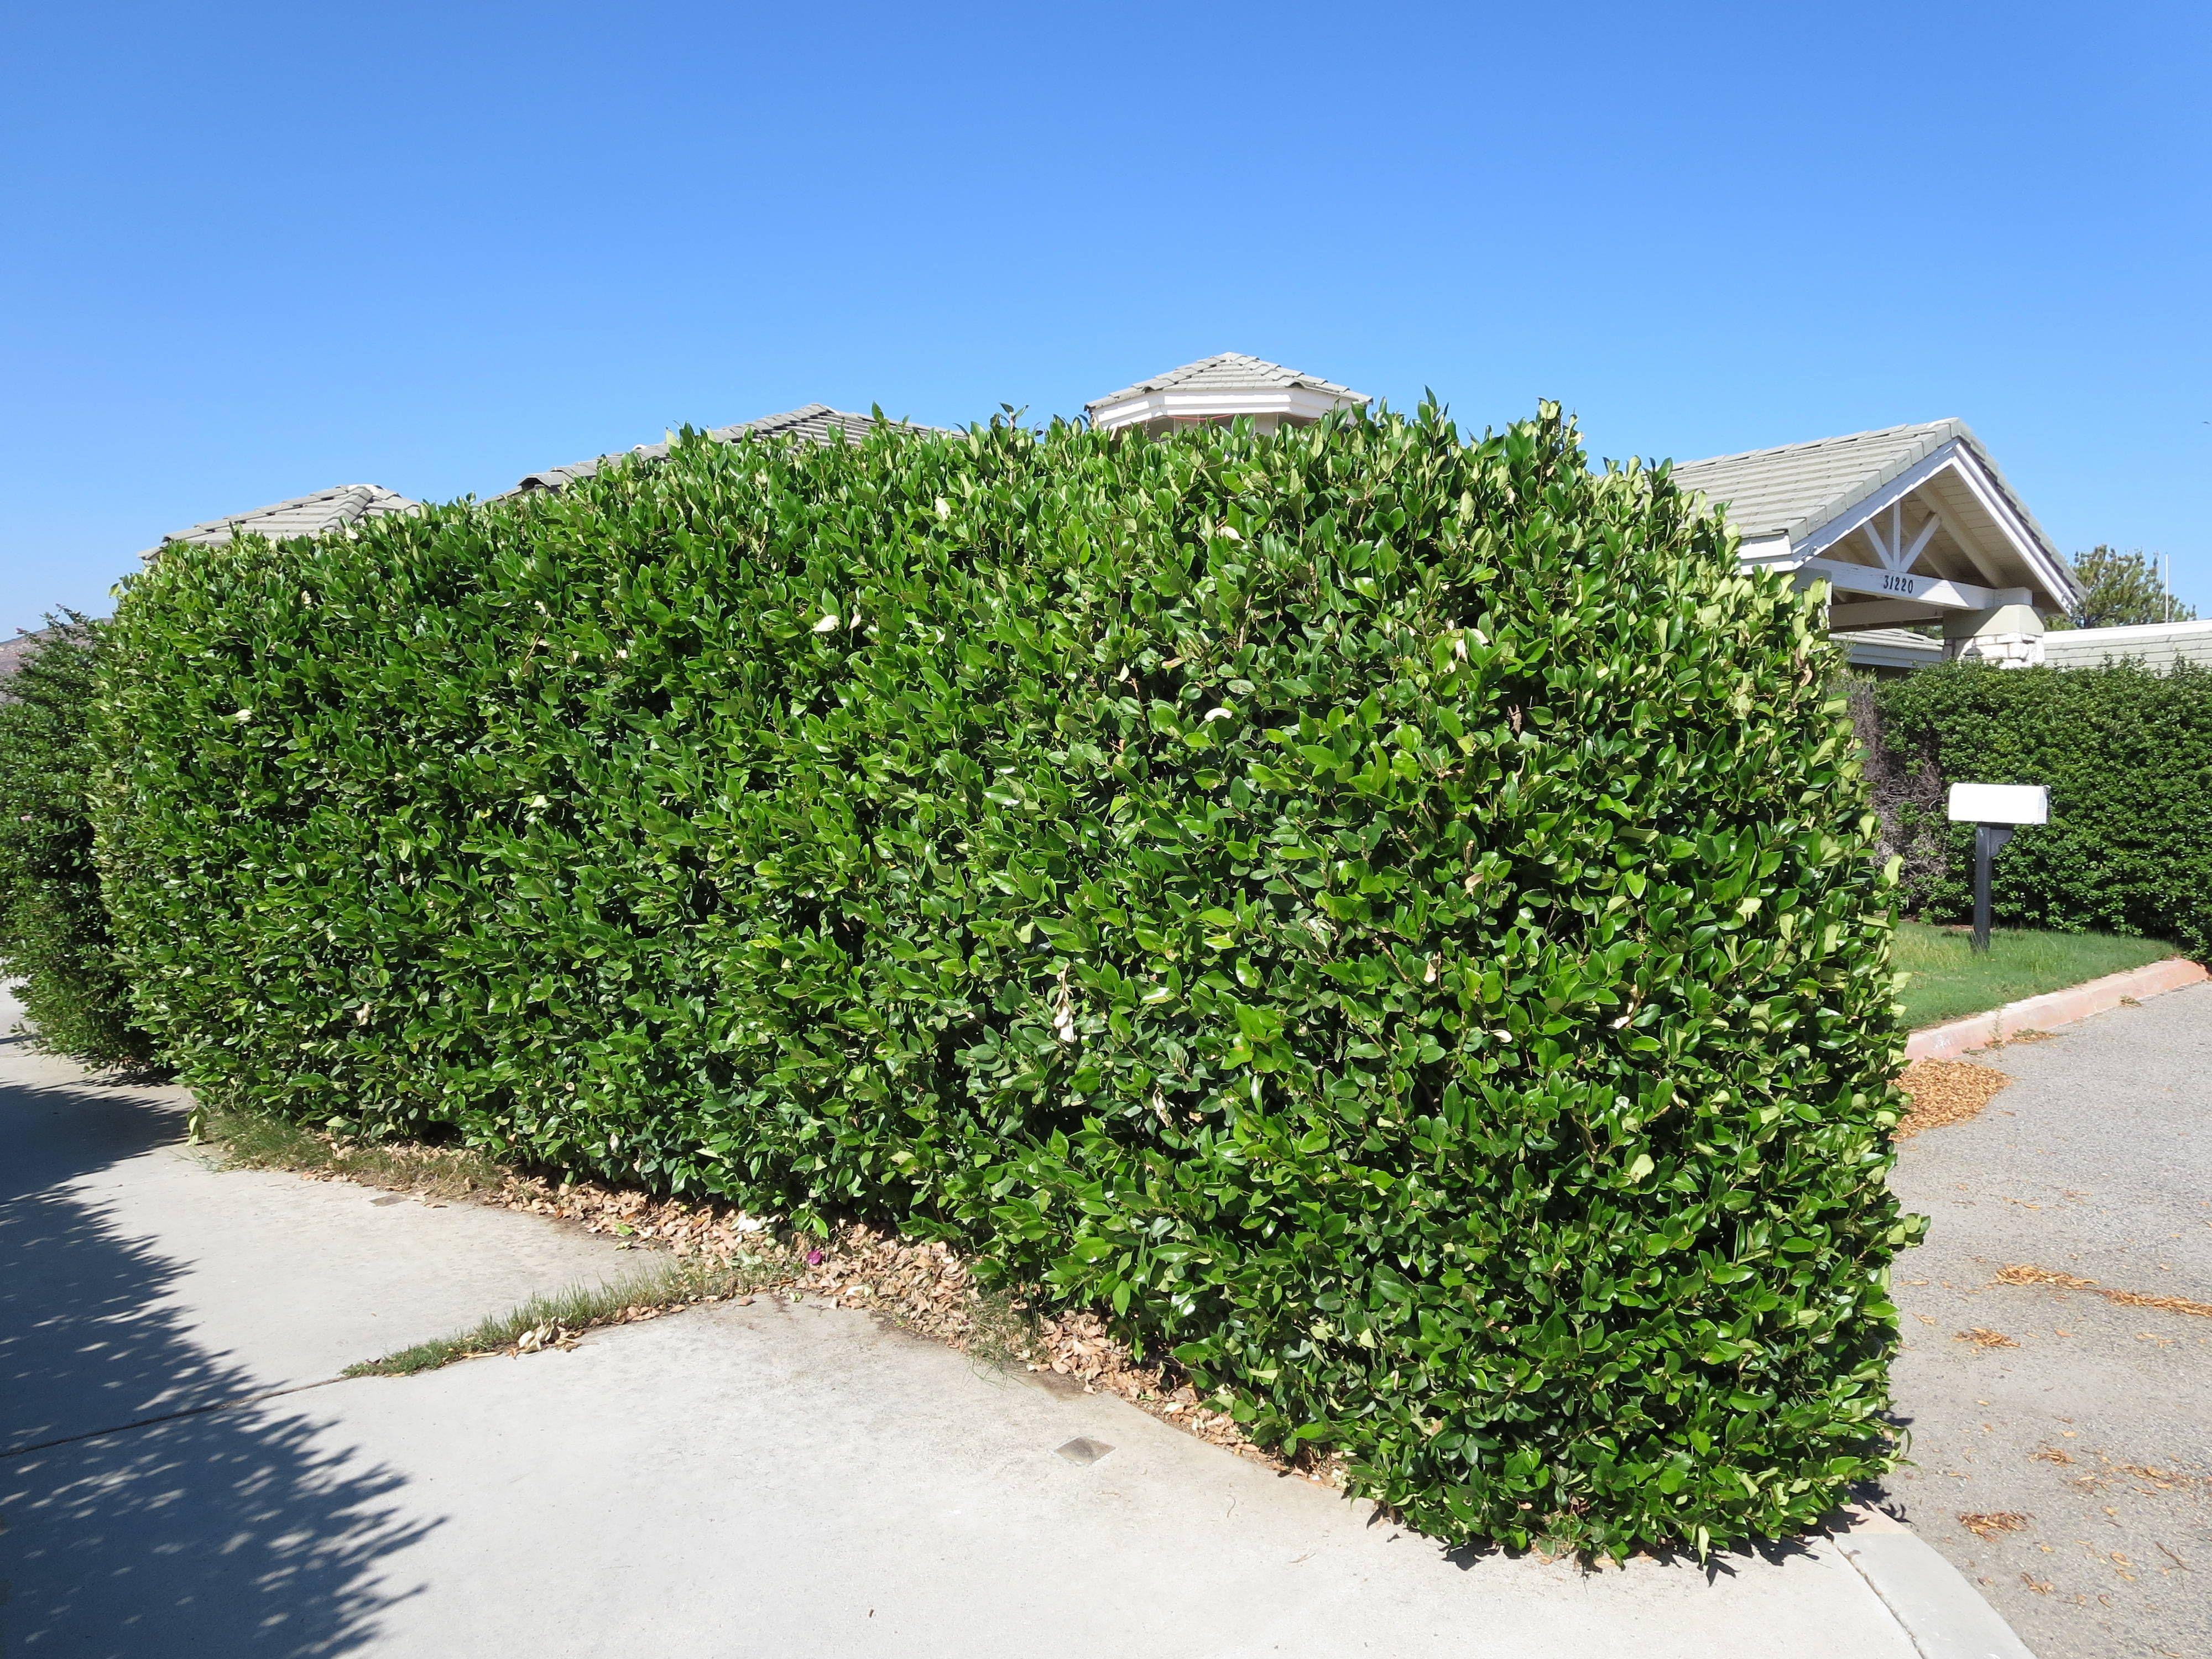 wax leaf privet hedge flowers and trees pinterest privet hedge and drought tolerant. Black Bedroom Furniture Sets. Home Design Ideas